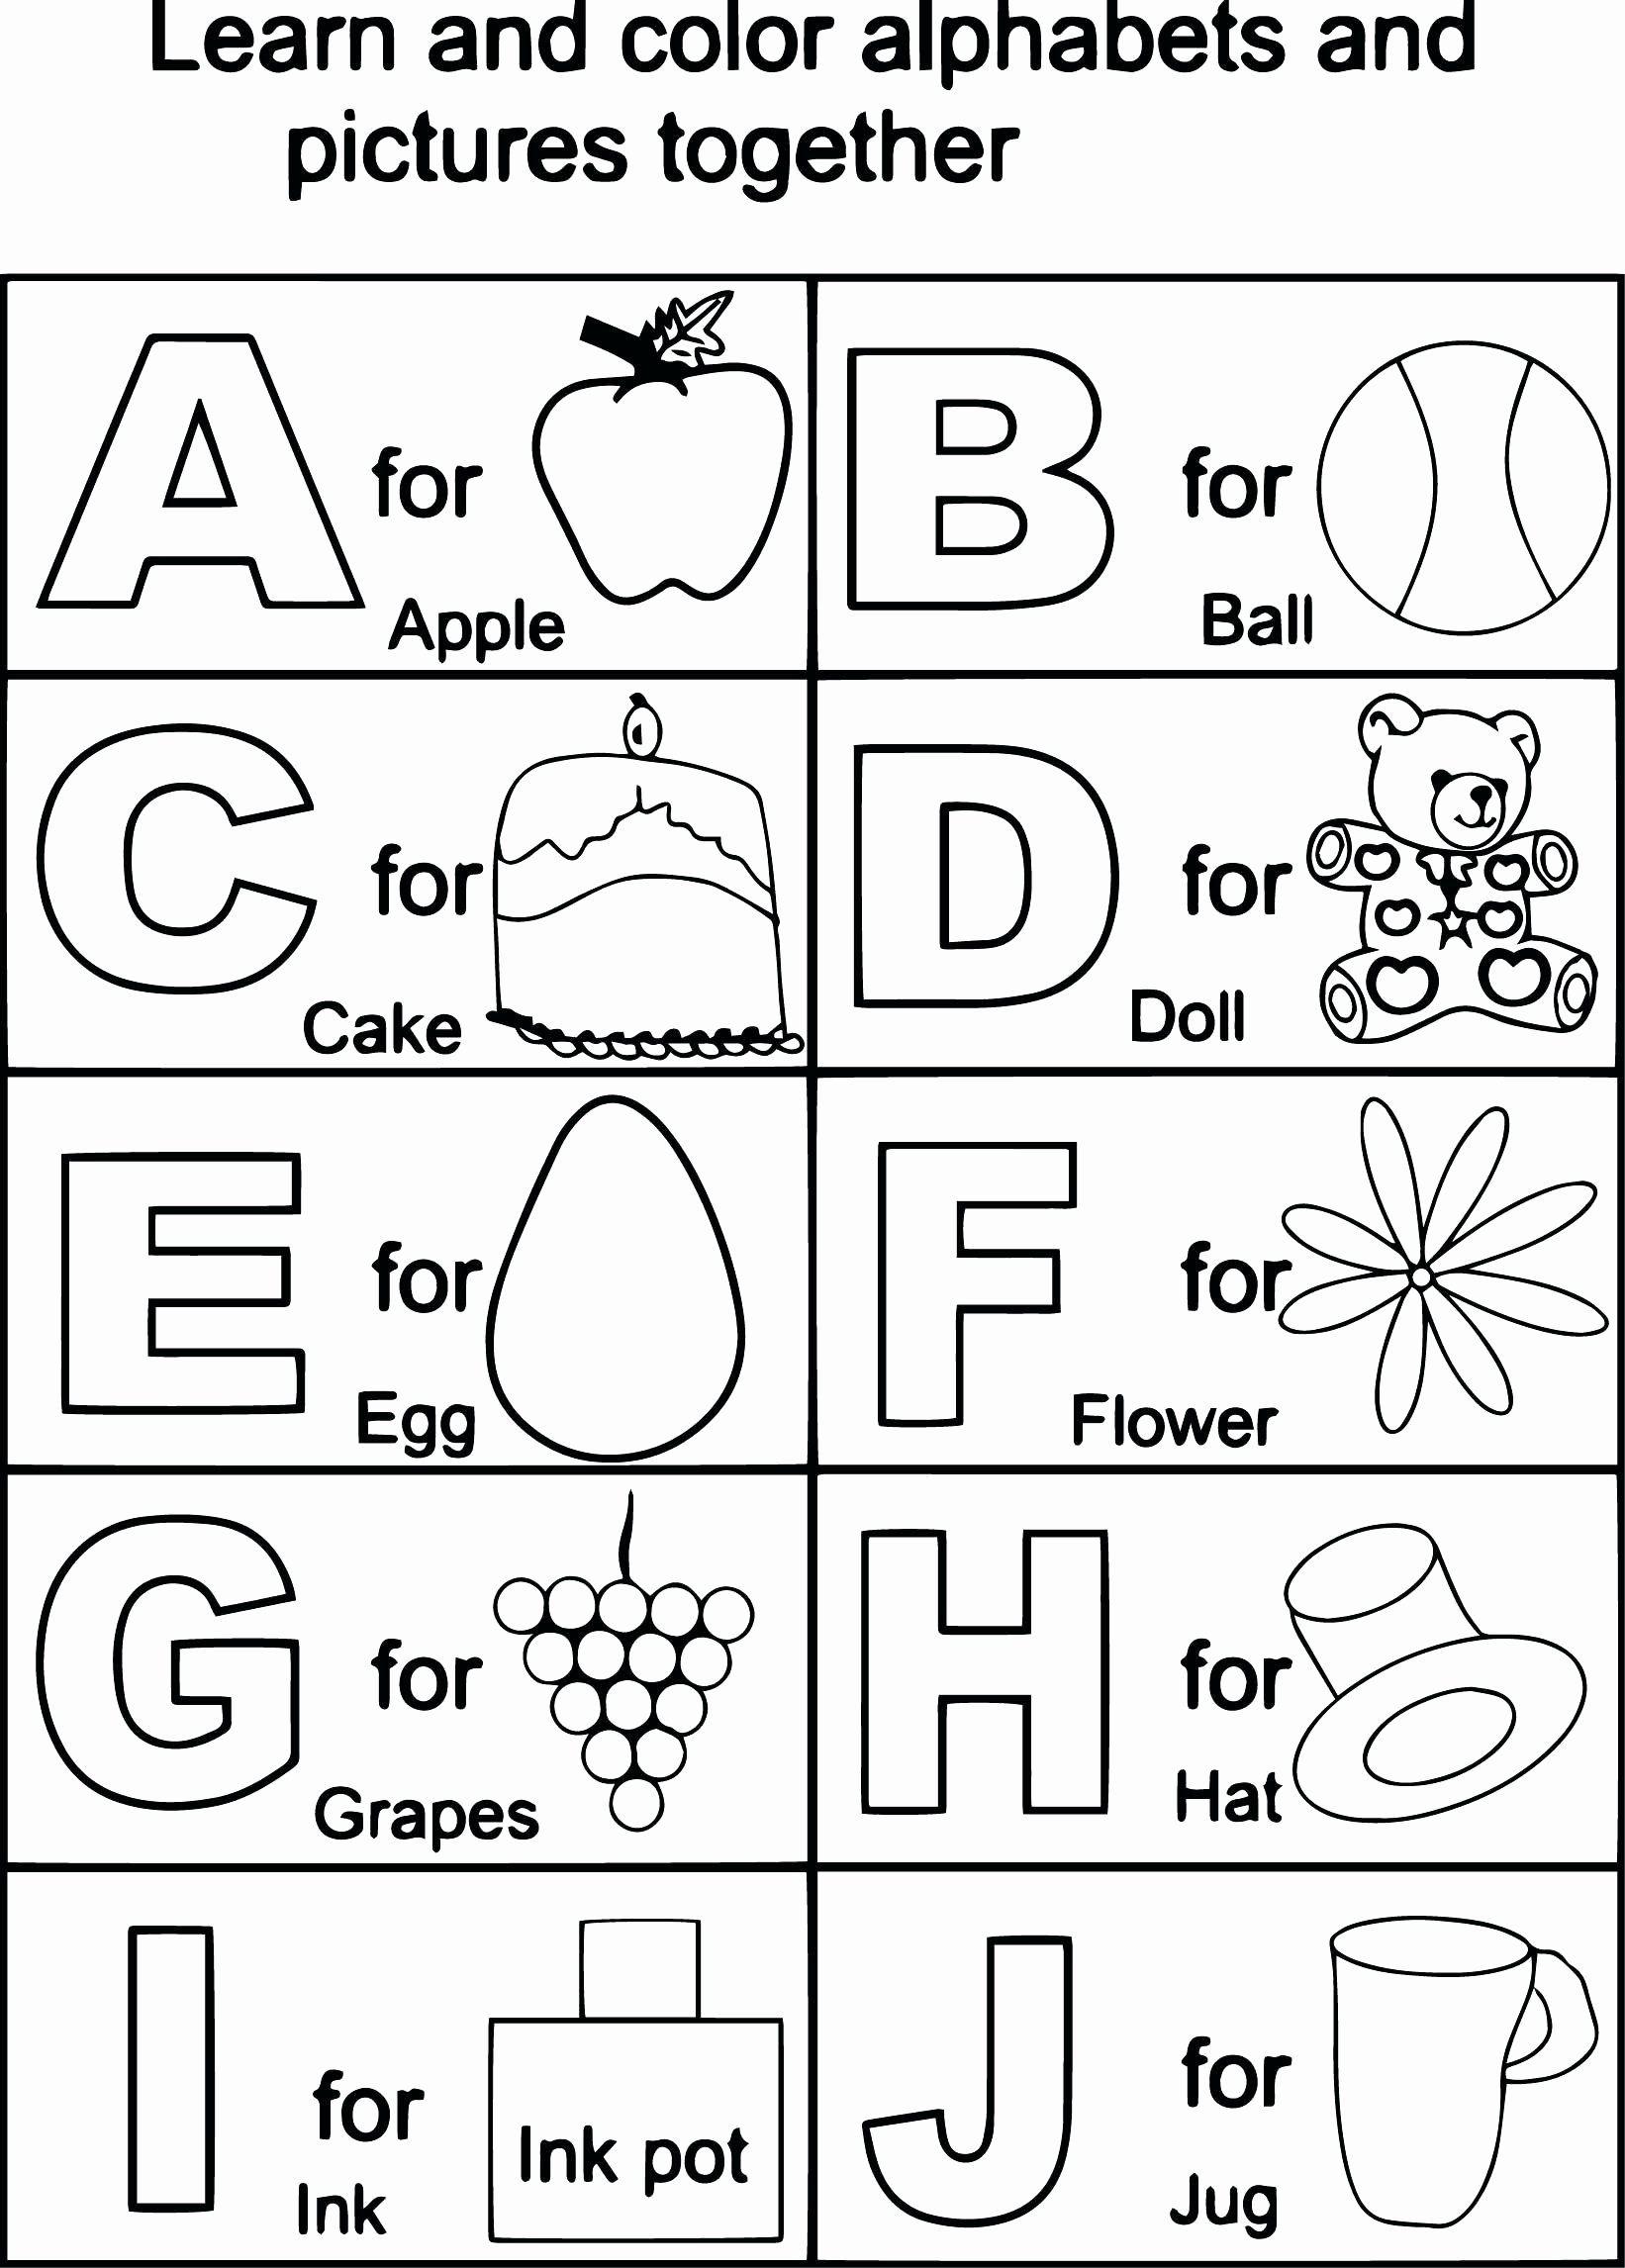 Alphabet Coloring Pages Printable Free Unique Free Alphabet Coloring Sheets Redhatsheet Tema Kelas Pendidikan Belajar